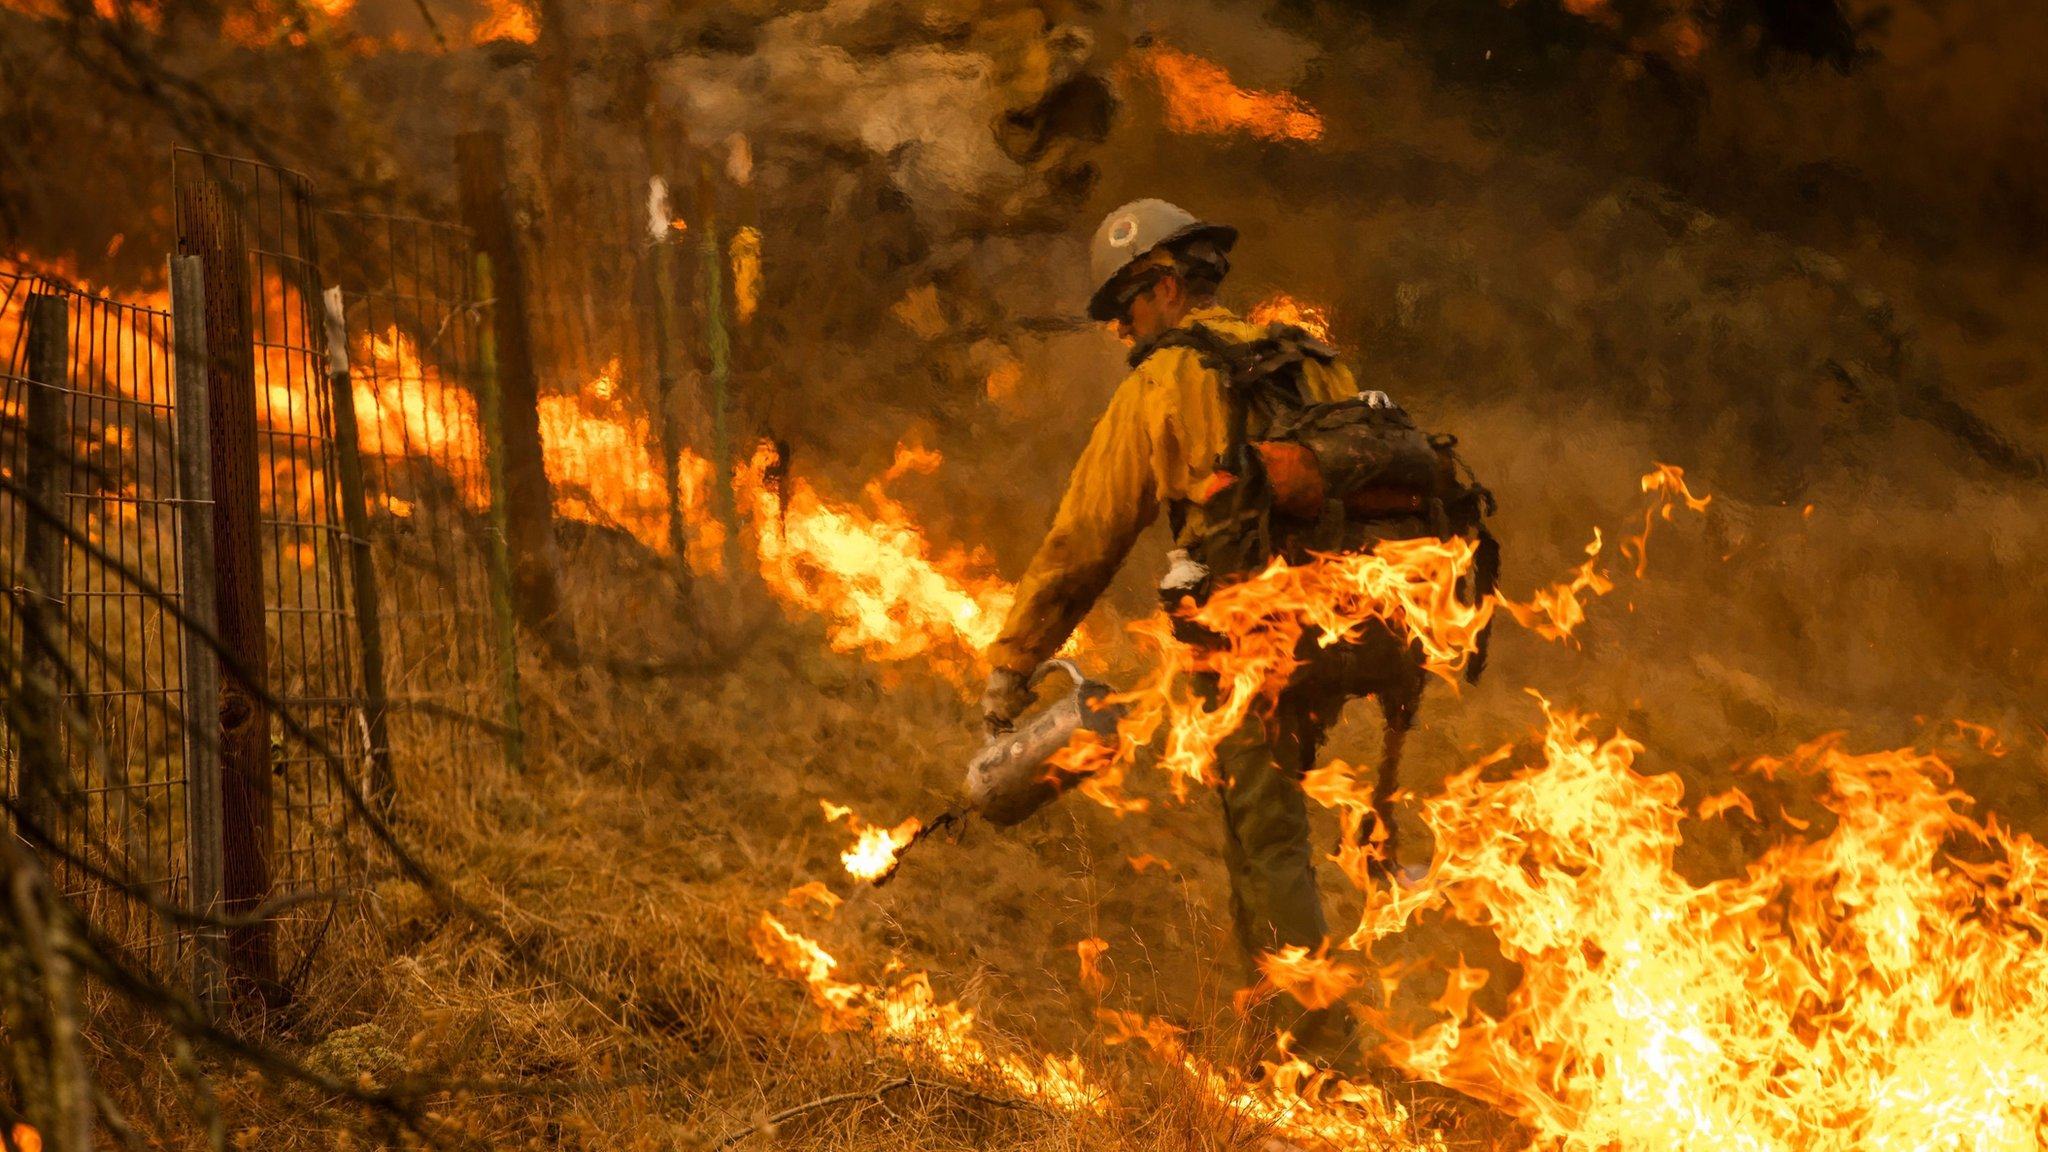 Vatrogasac se bori sa požarom